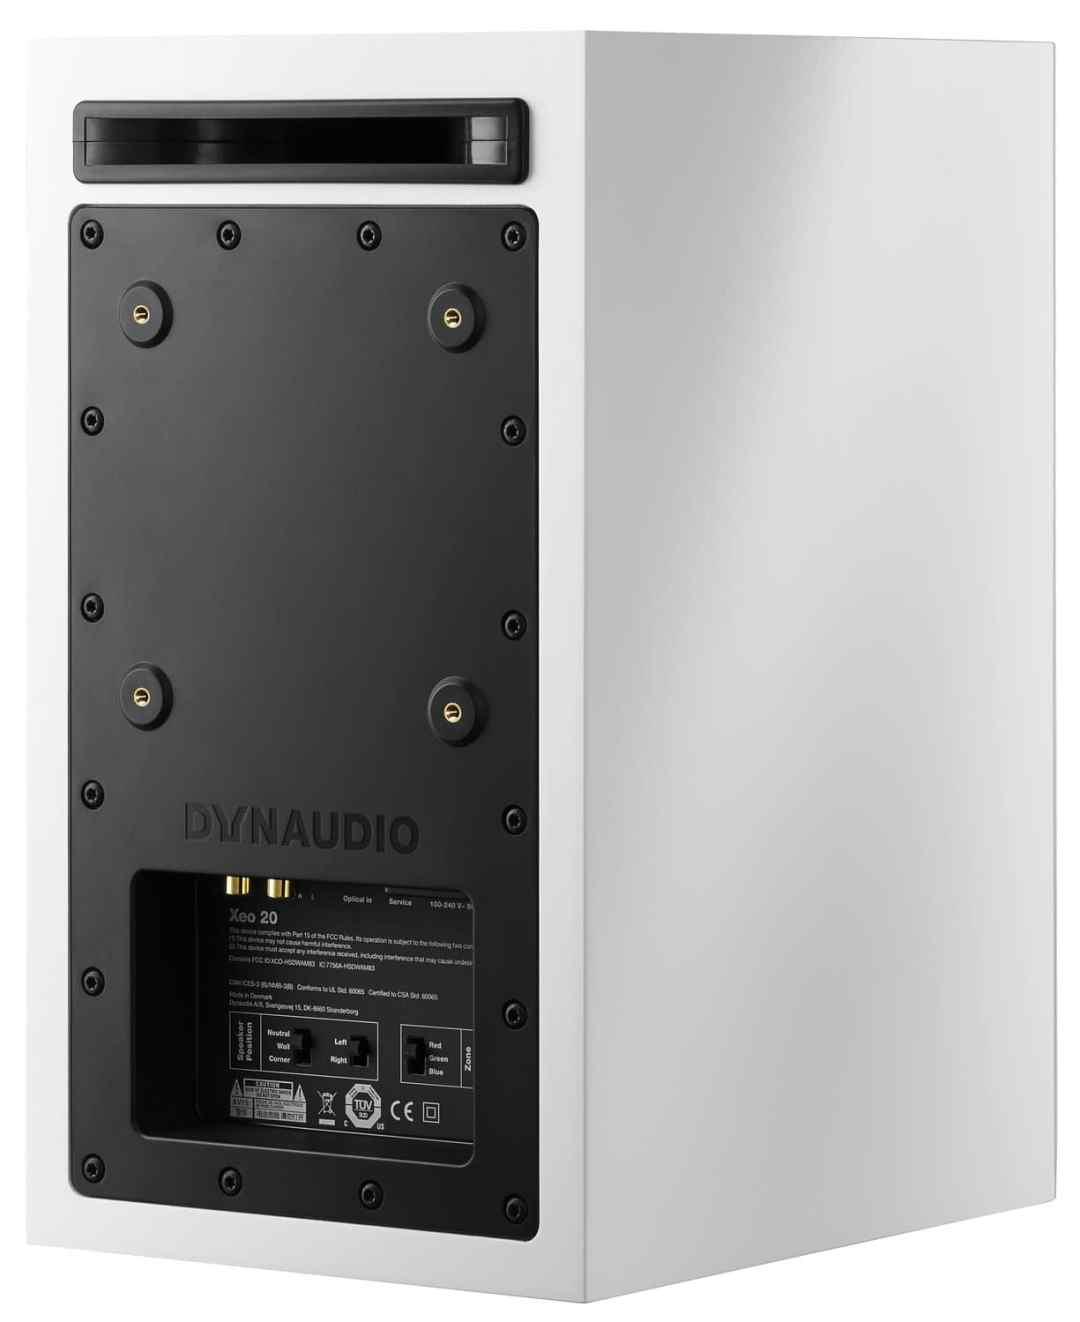 Dynaudio updates award-winning Xeo range